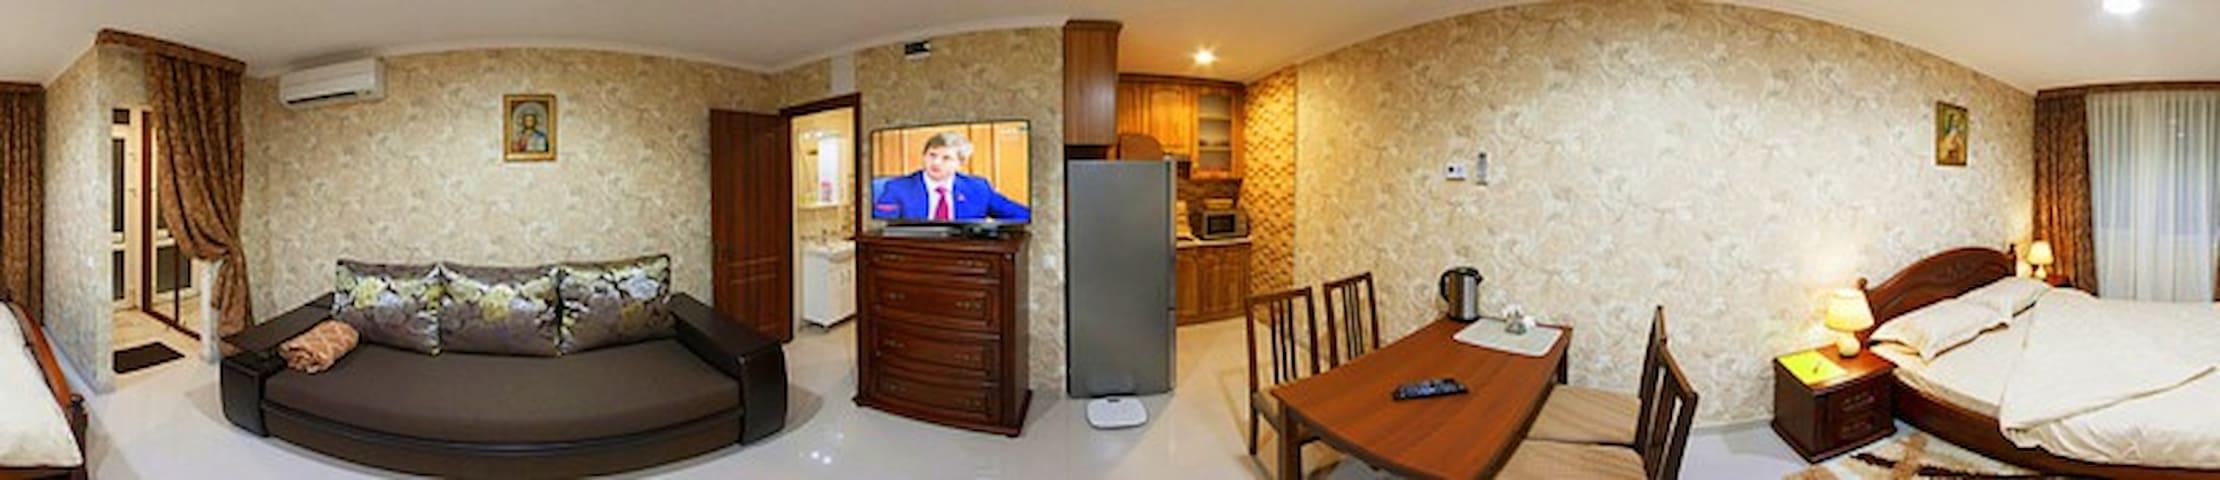 NEW Studio Free WiFi Terrace - Truskavets' - Apartment